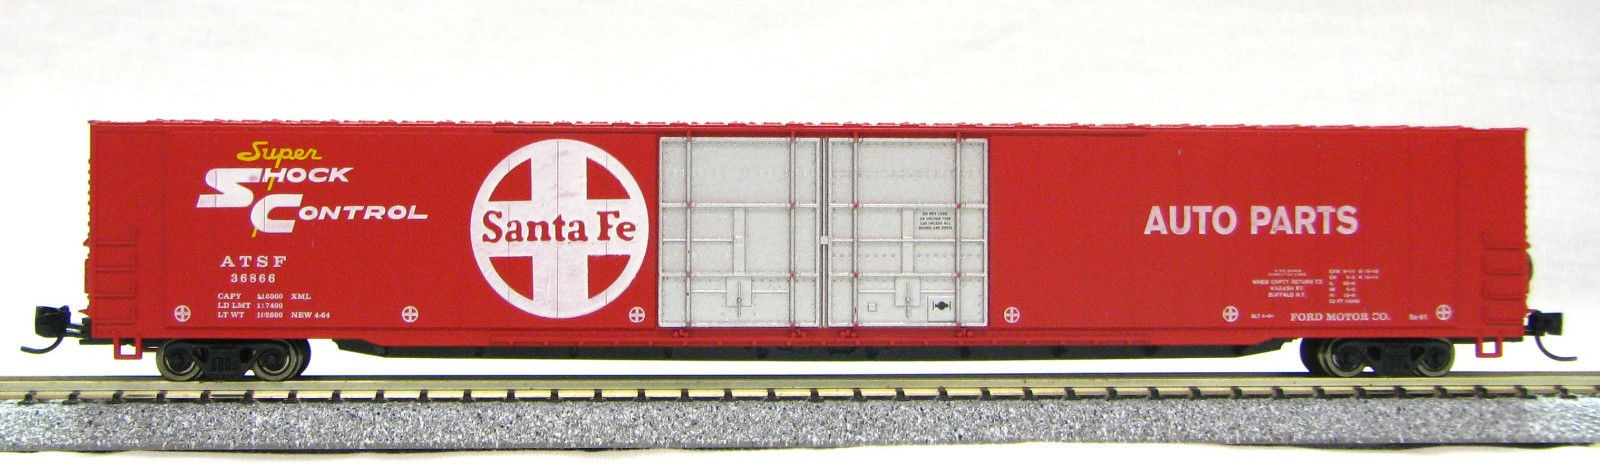 N Scale 4 Door 85 Ft Hi-Cube, Santa Fe,Shock Control (with MT couplers) 1-014663